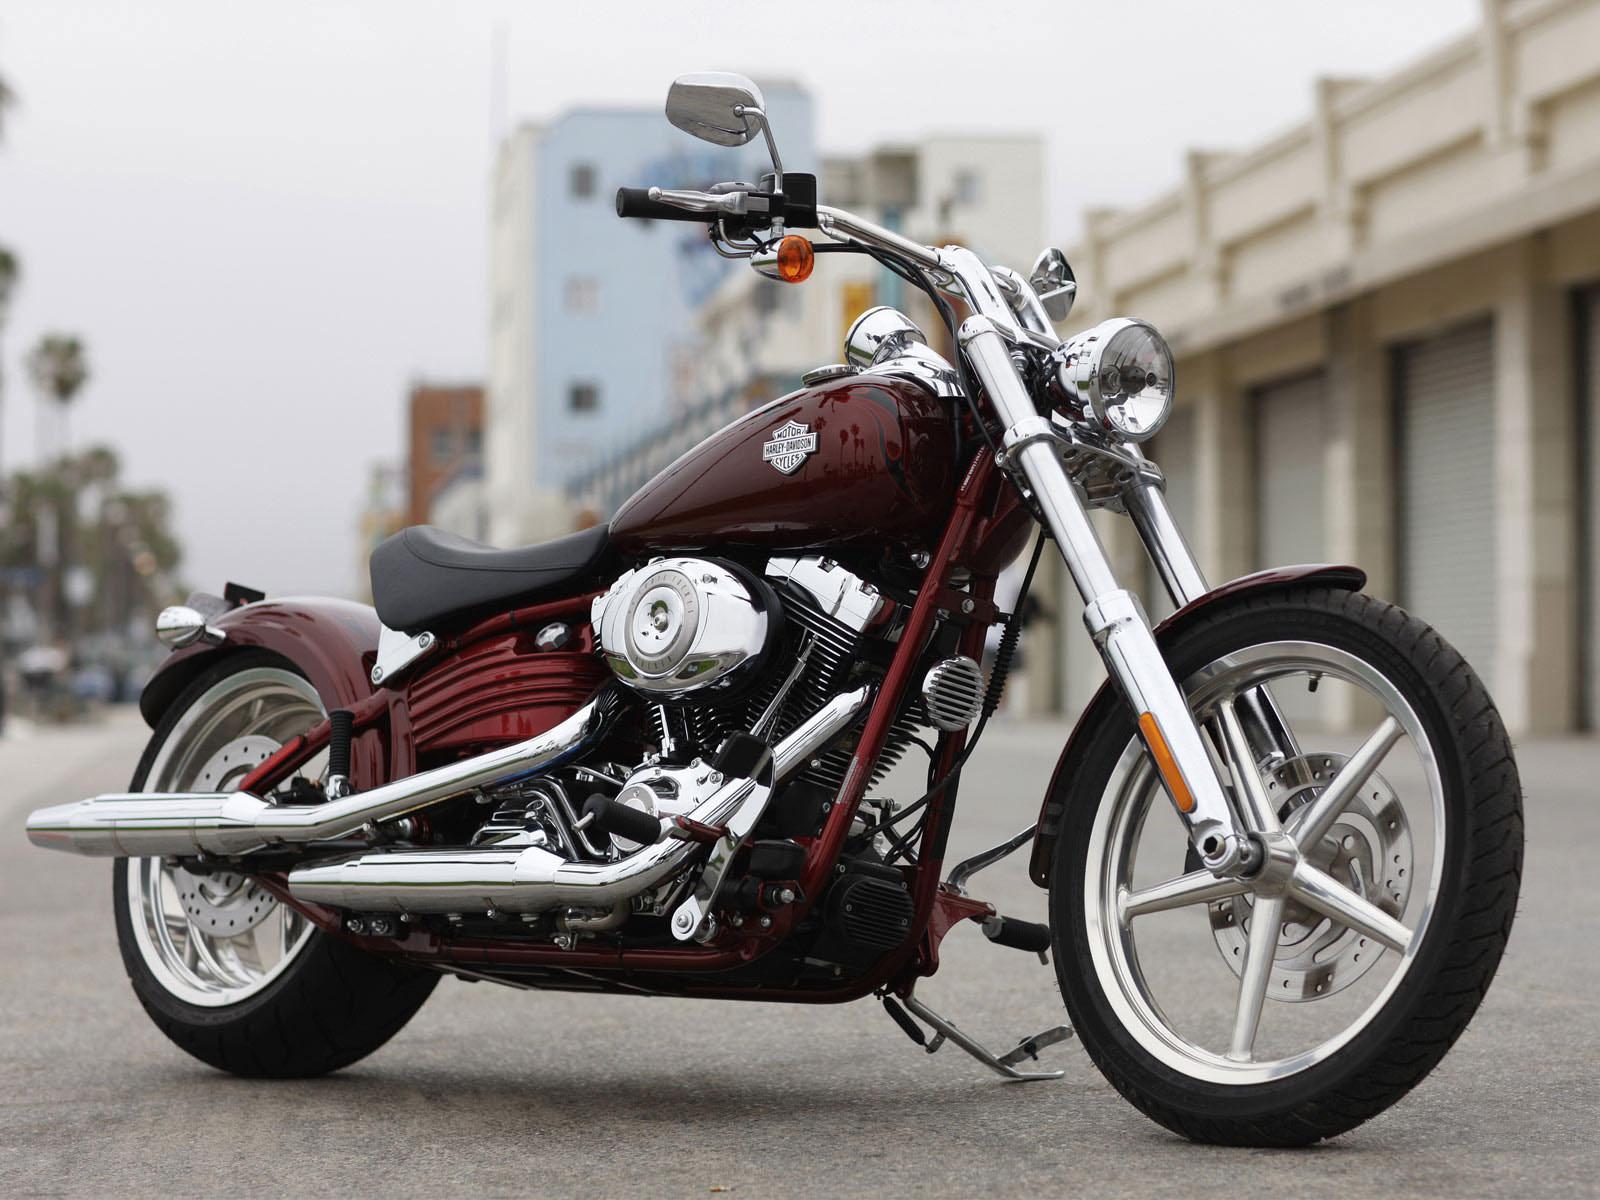 Harley Davidson FXCWC Softail Rocker Motorcycle